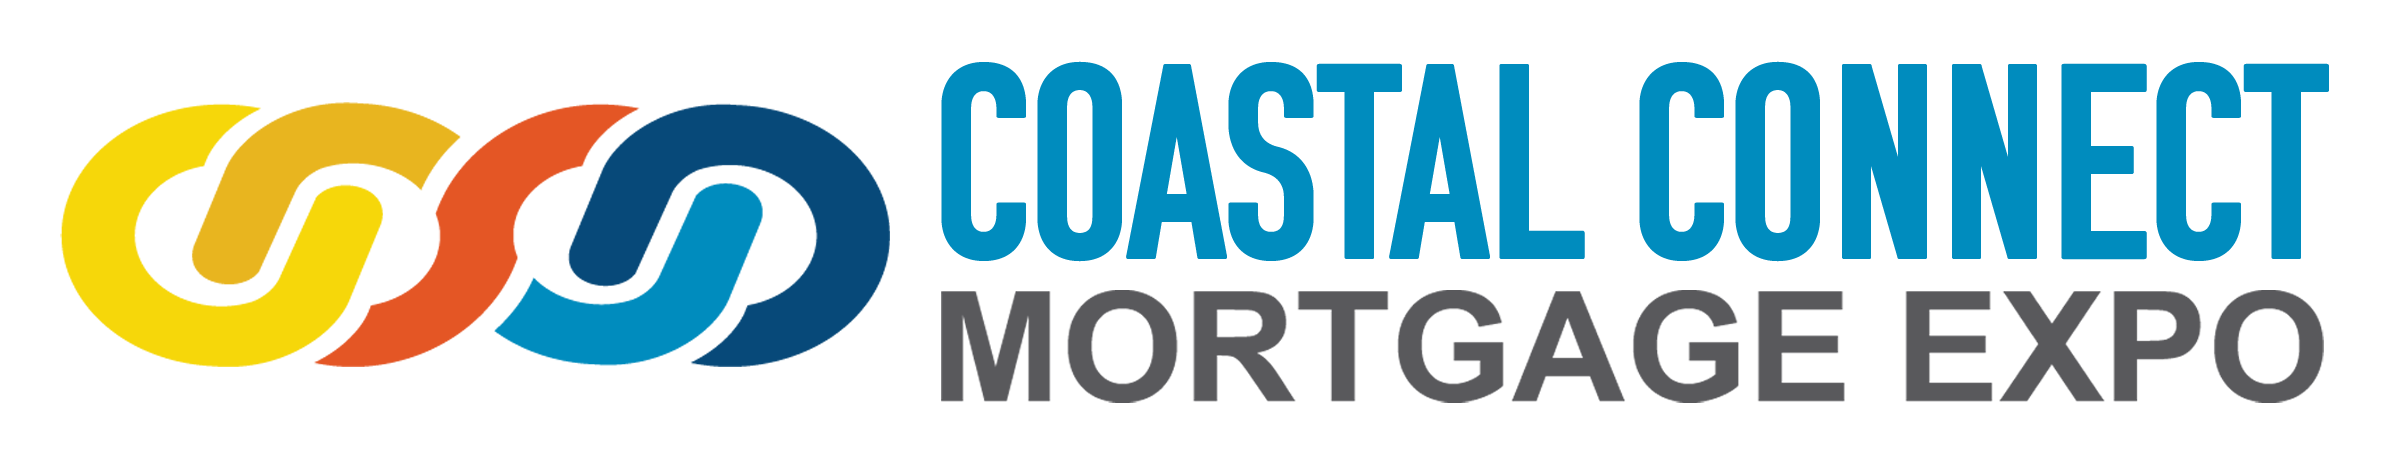 Coastal Connect Mortgage Expo